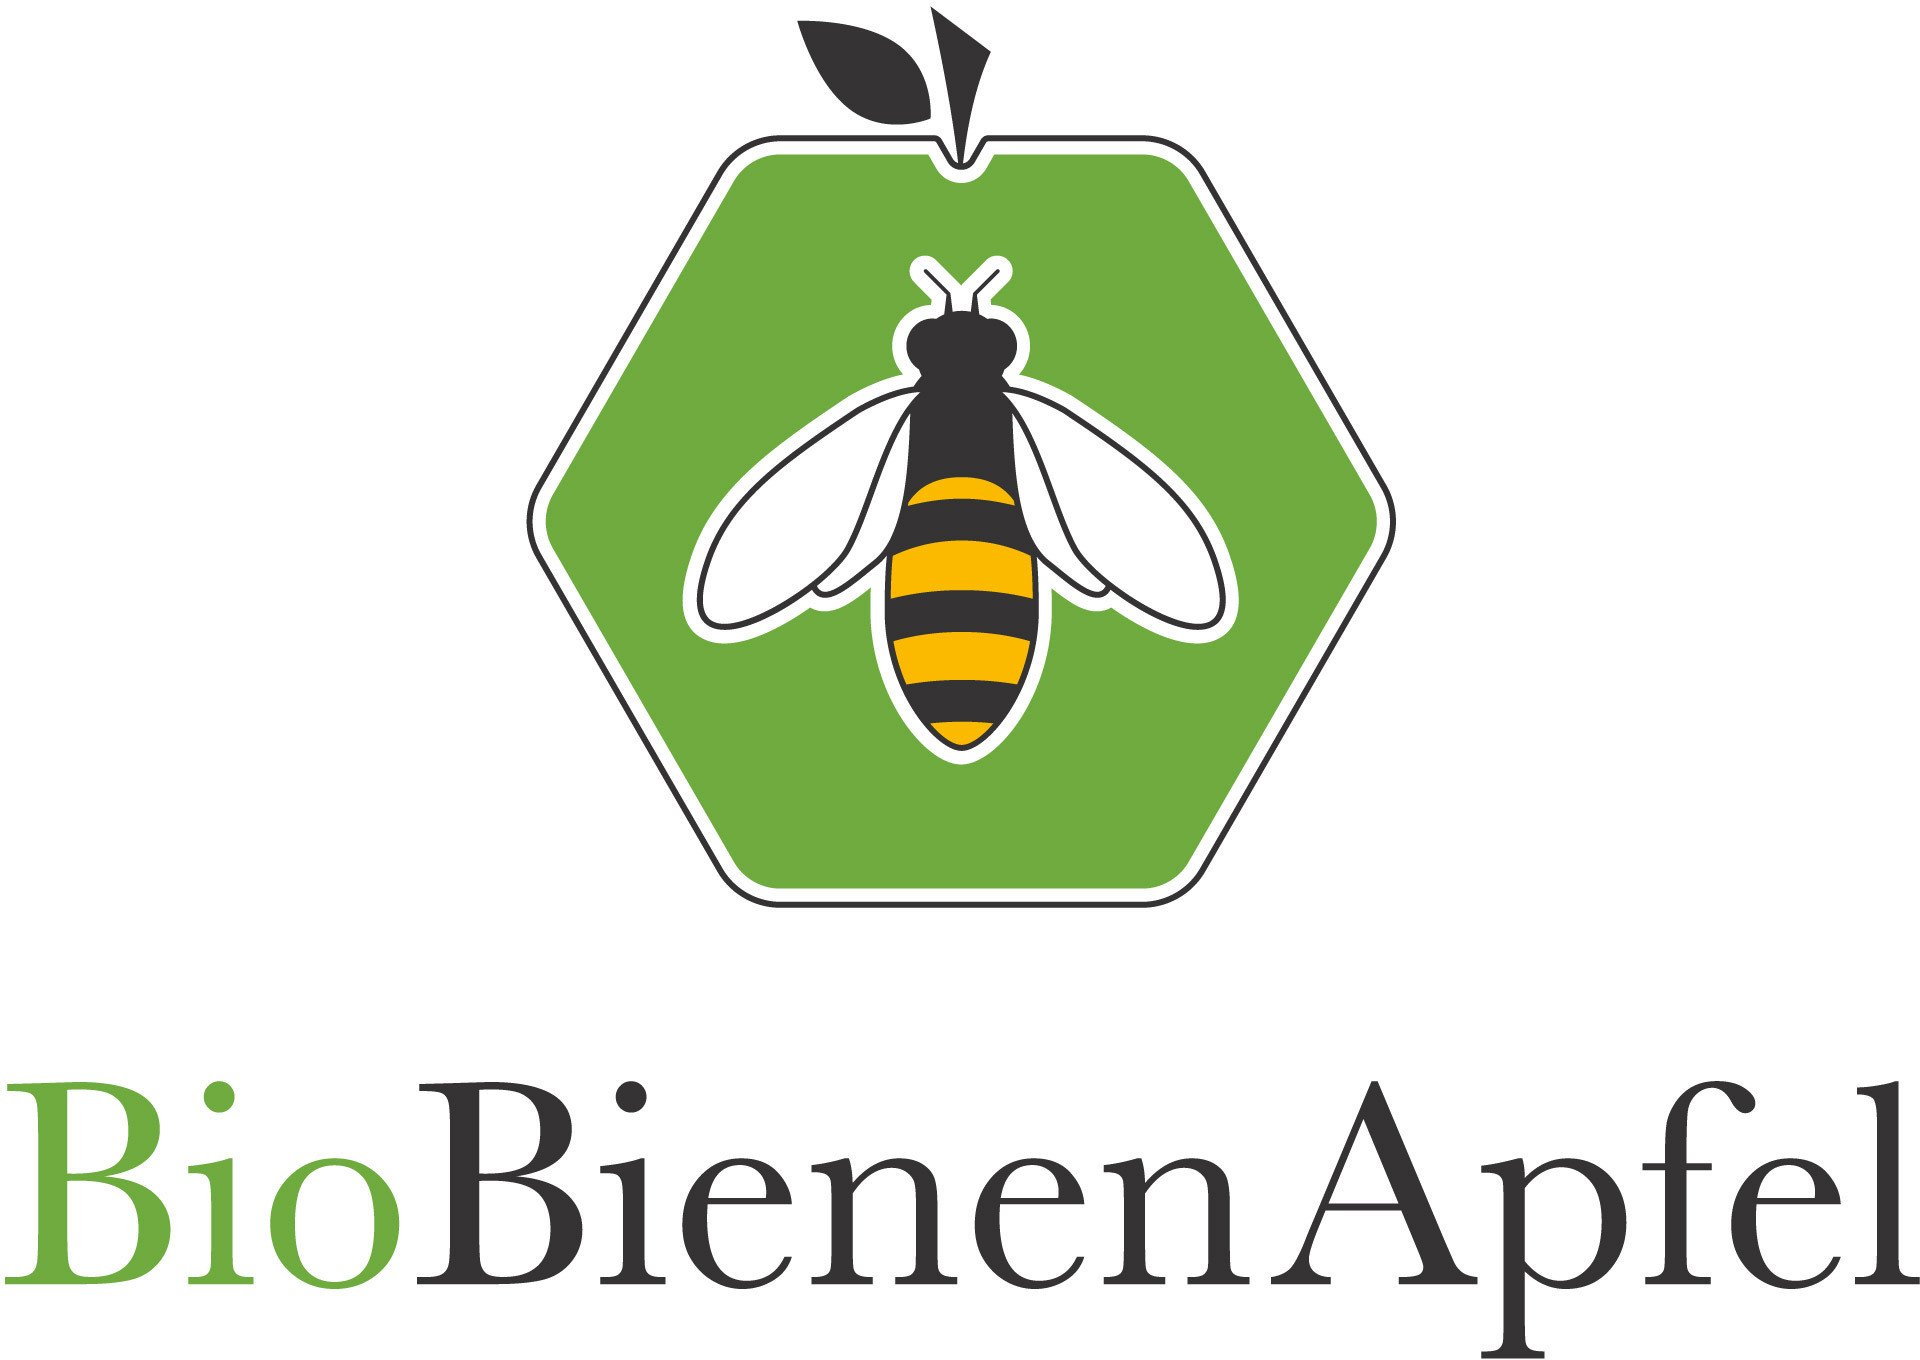 BioBienenApfel.jpg